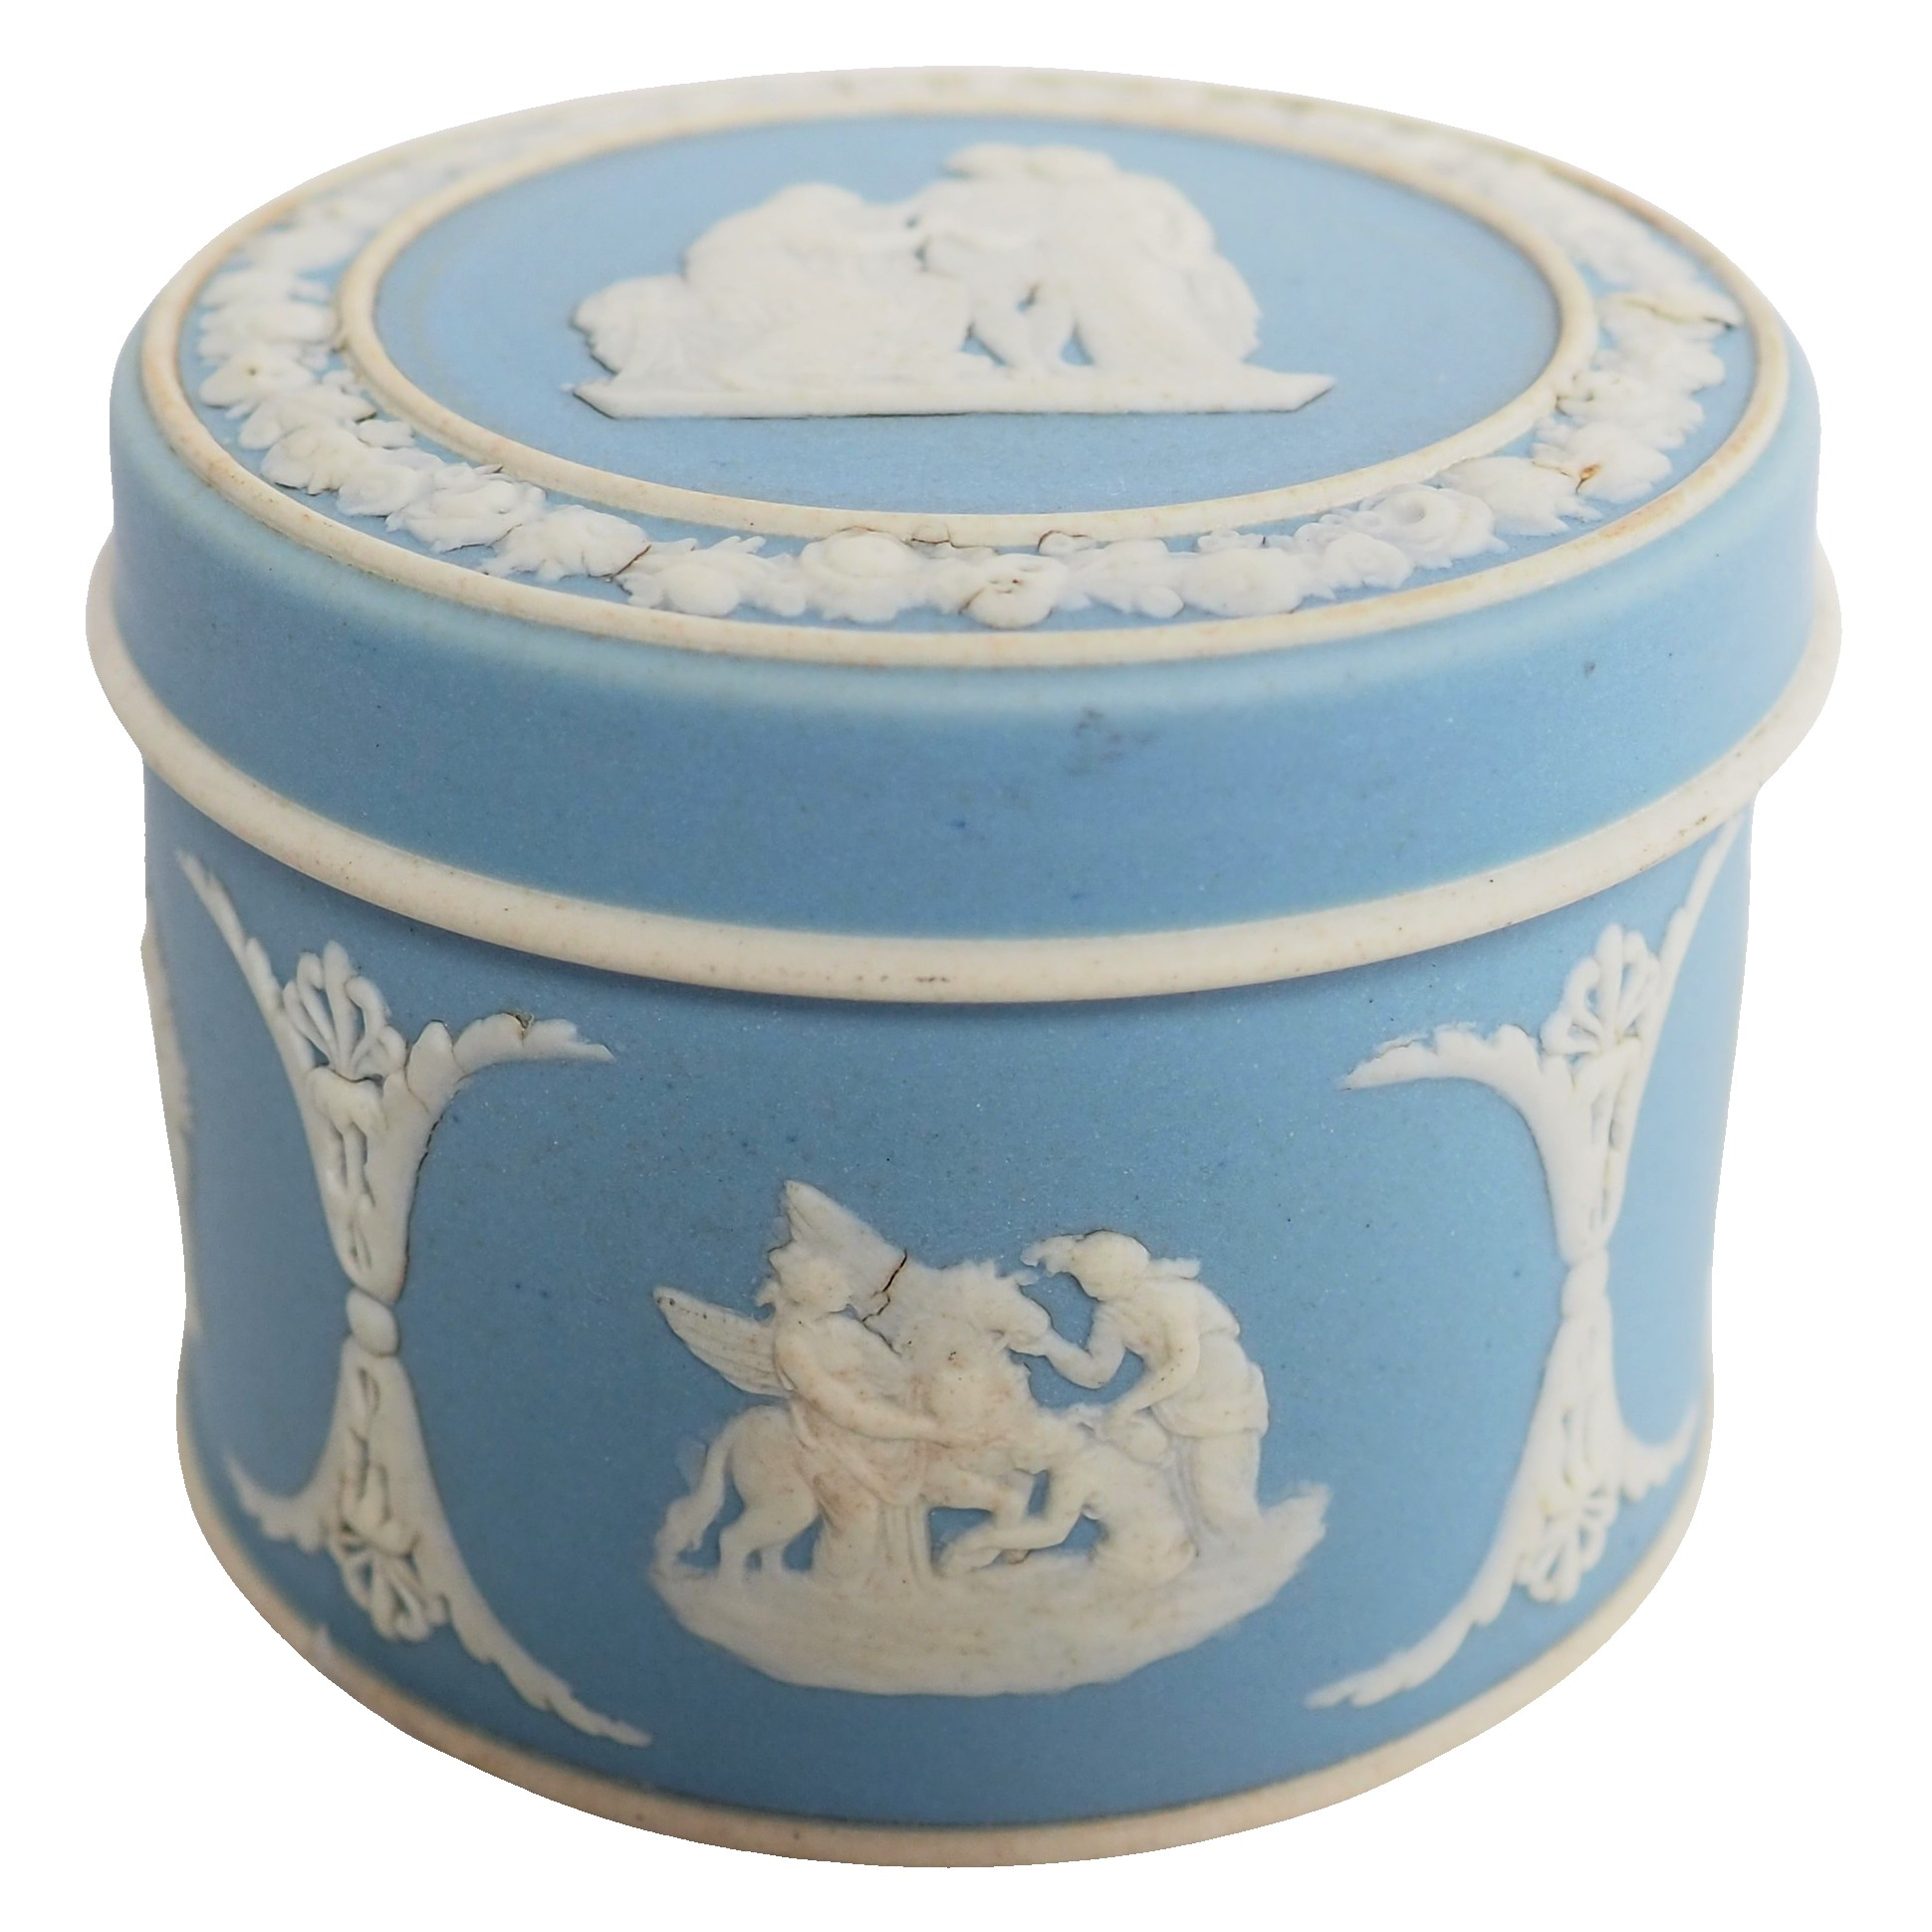 Wedgwood : boîte en biscuit polychrome bleu clair